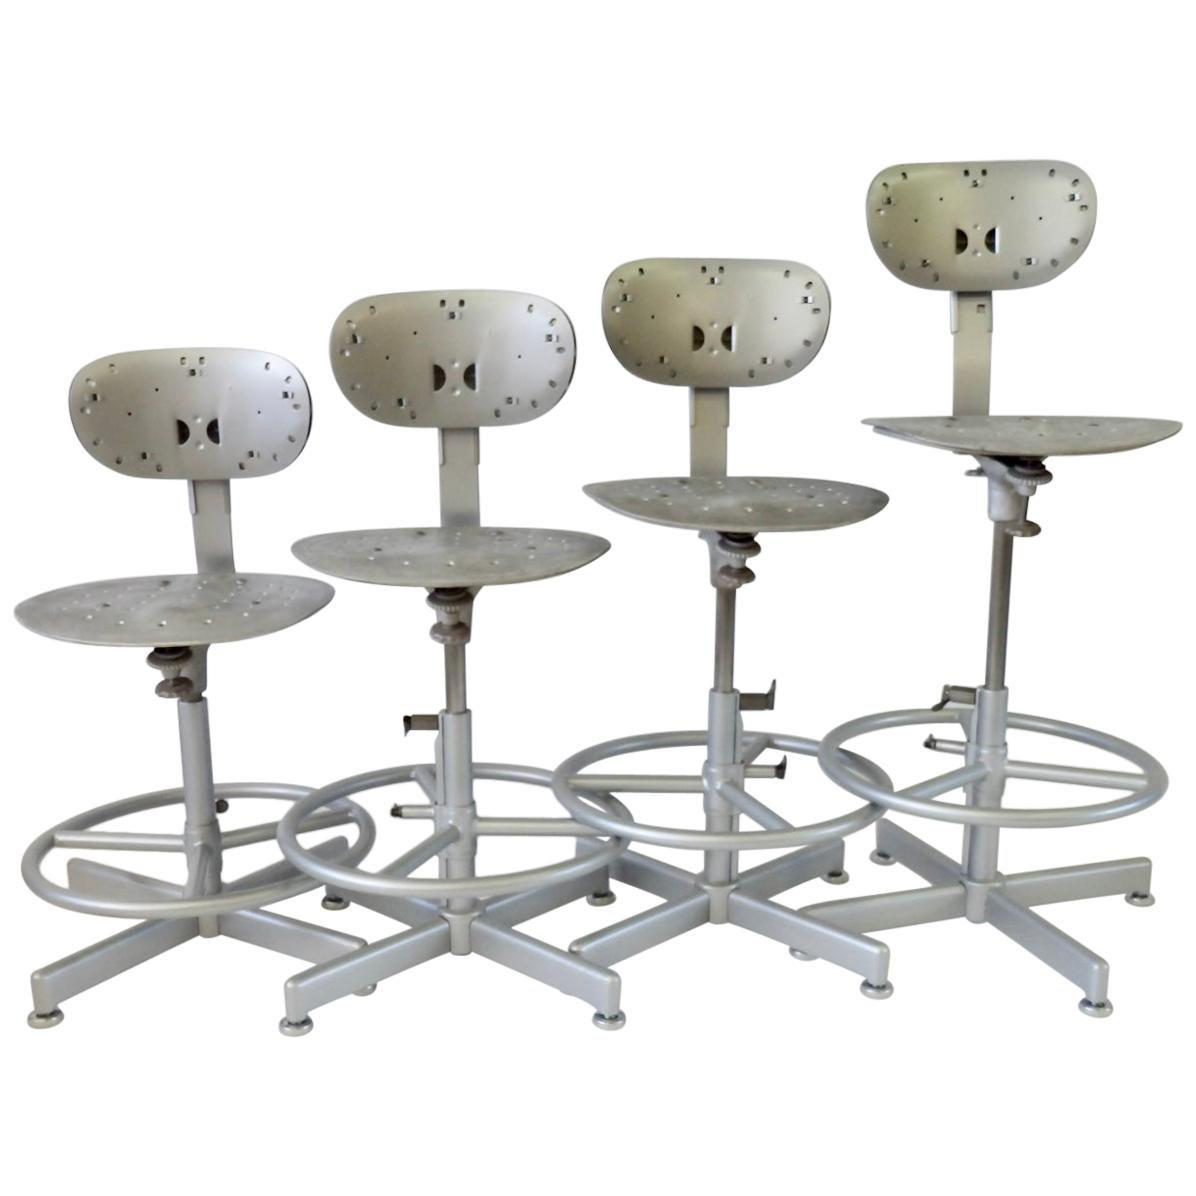 Four Multi Adjustable Industrial Operators Swivel Bar or Counter Stools